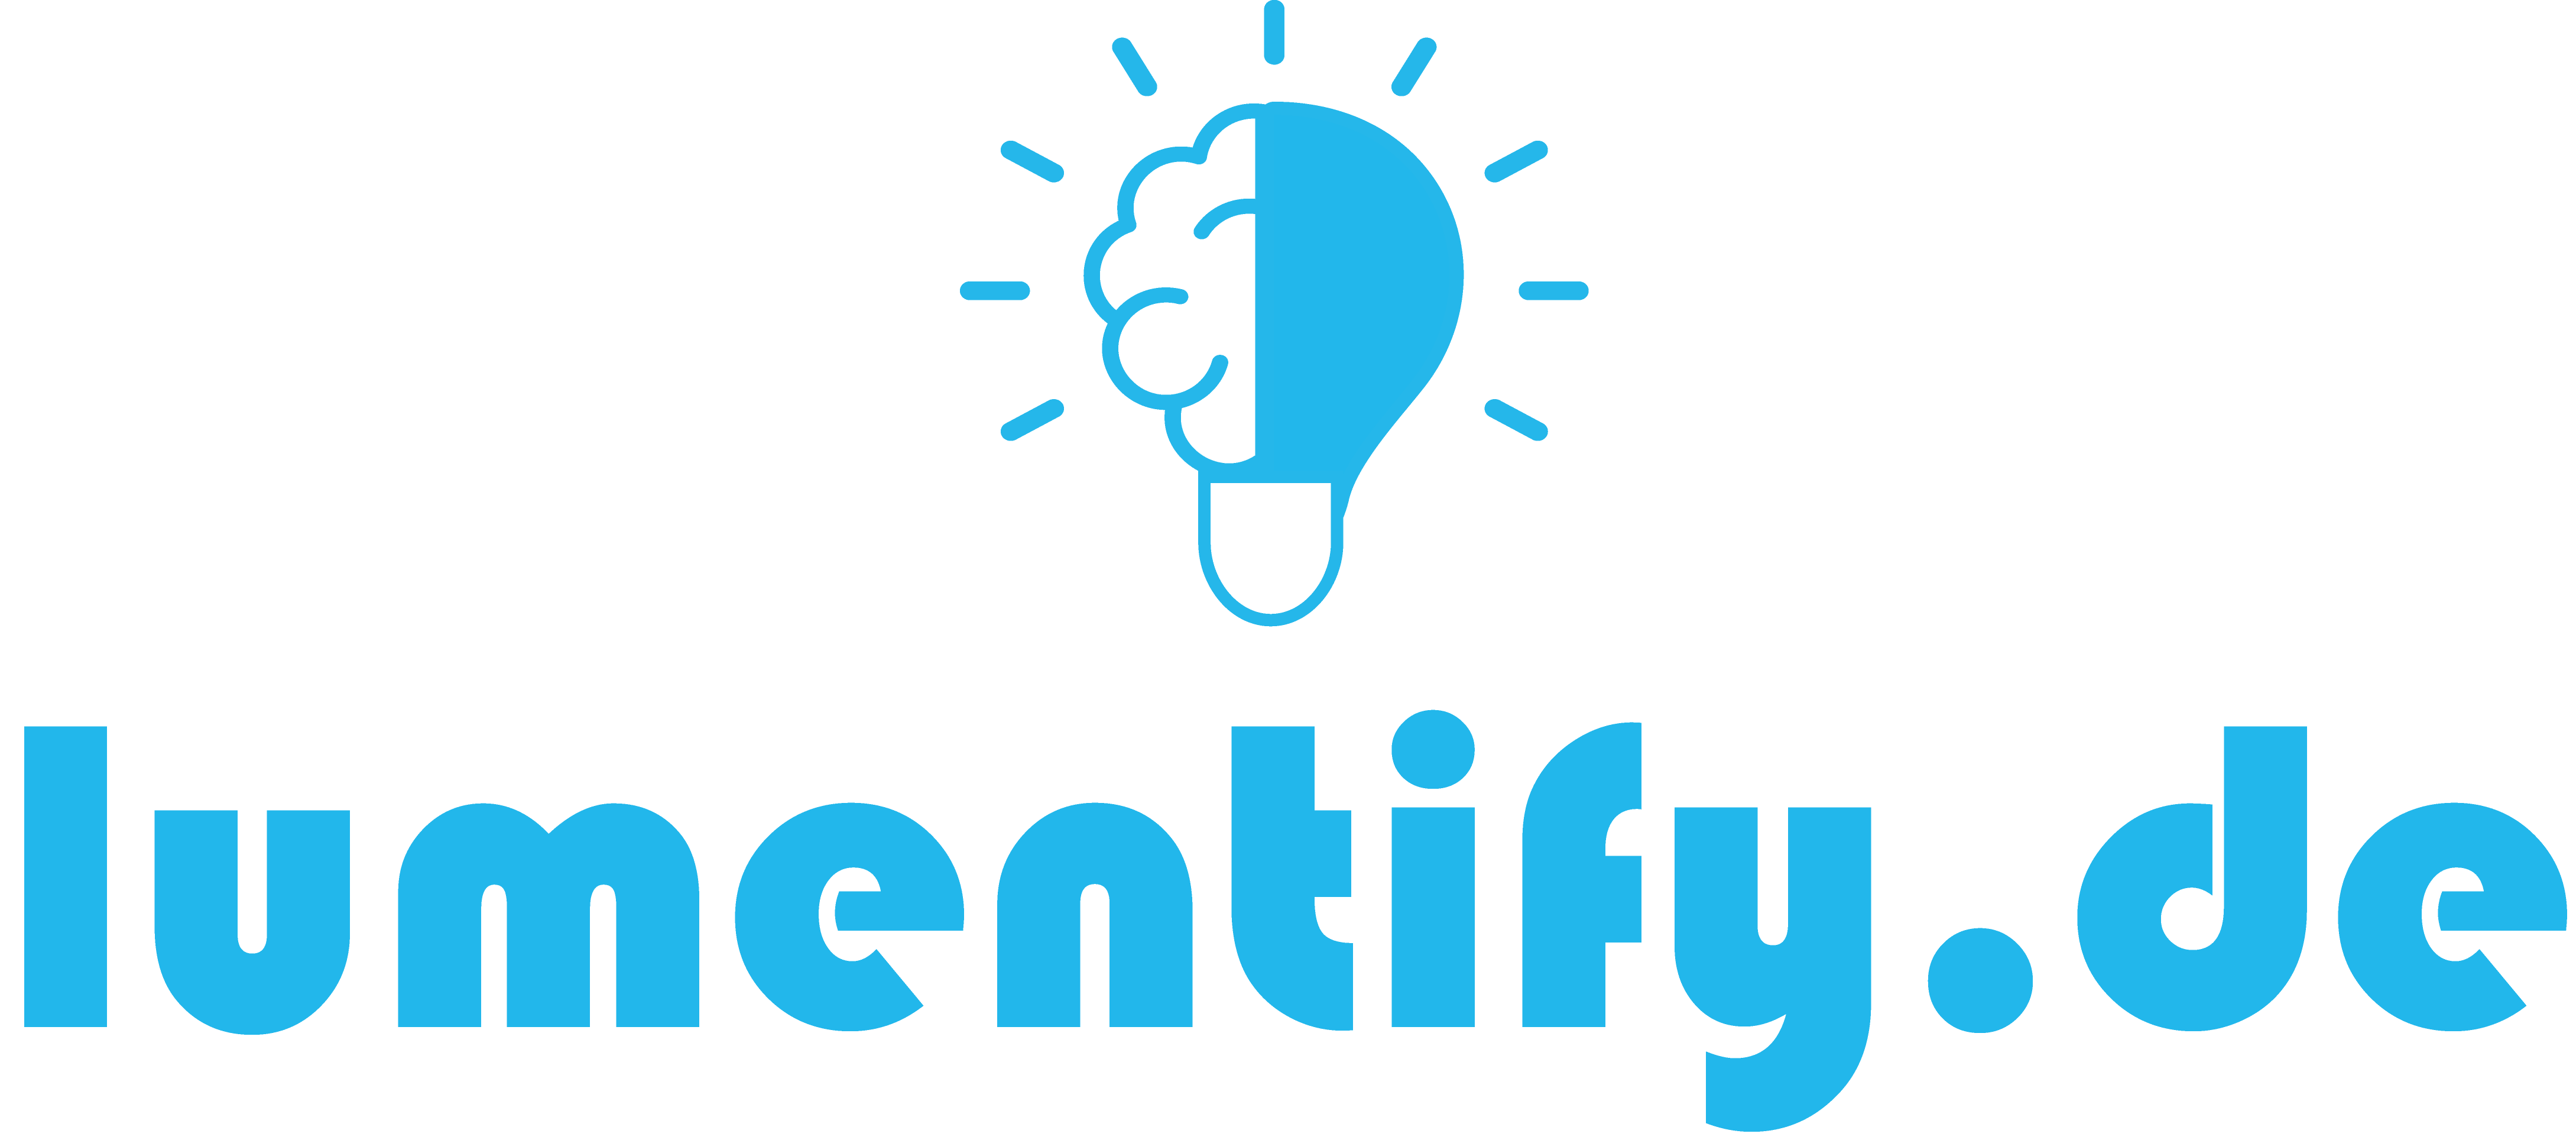 lumentify